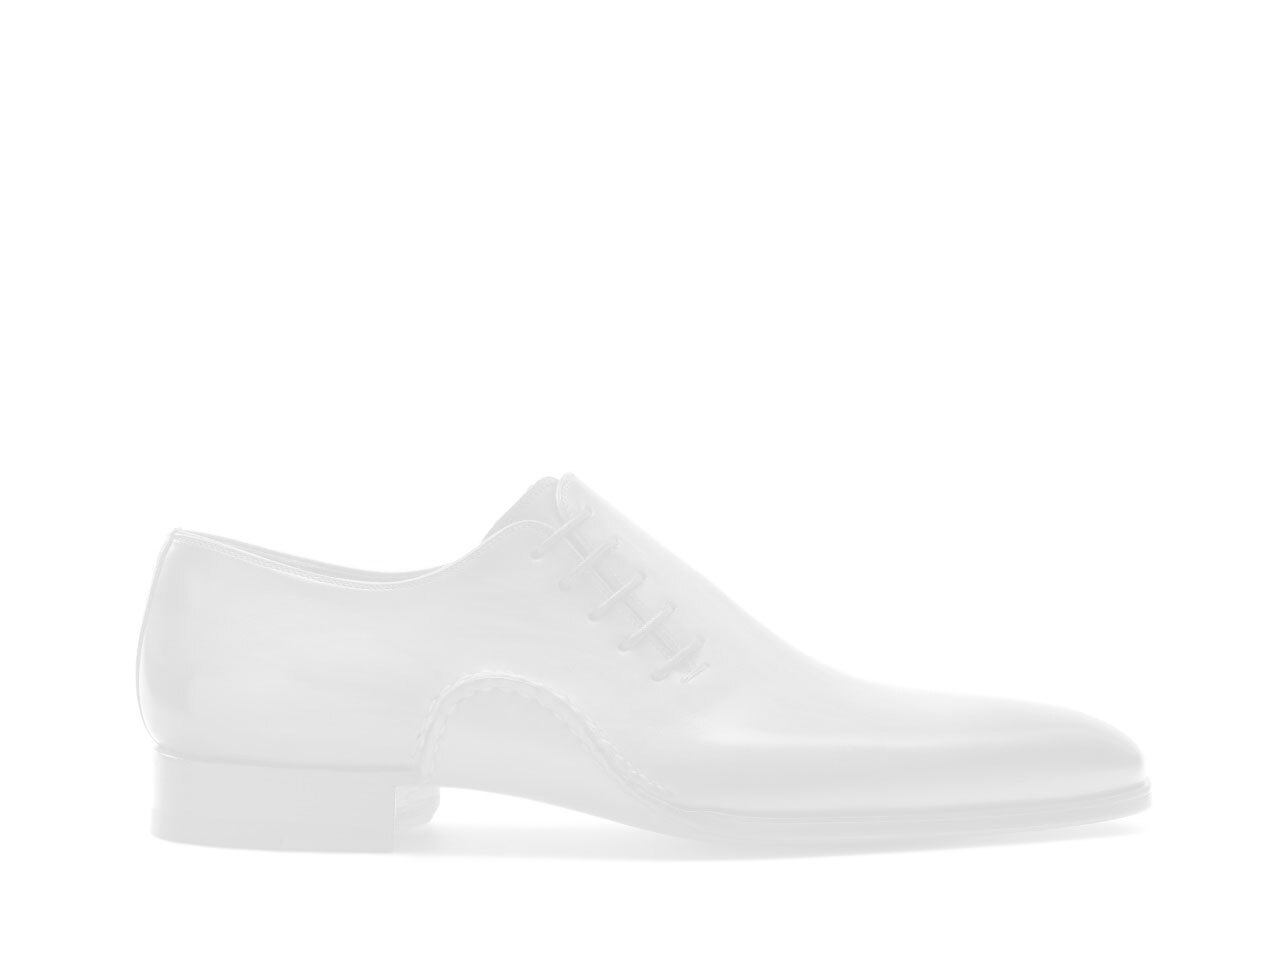 Sole of the Magnanni Merino II Navy Men's Sneakers